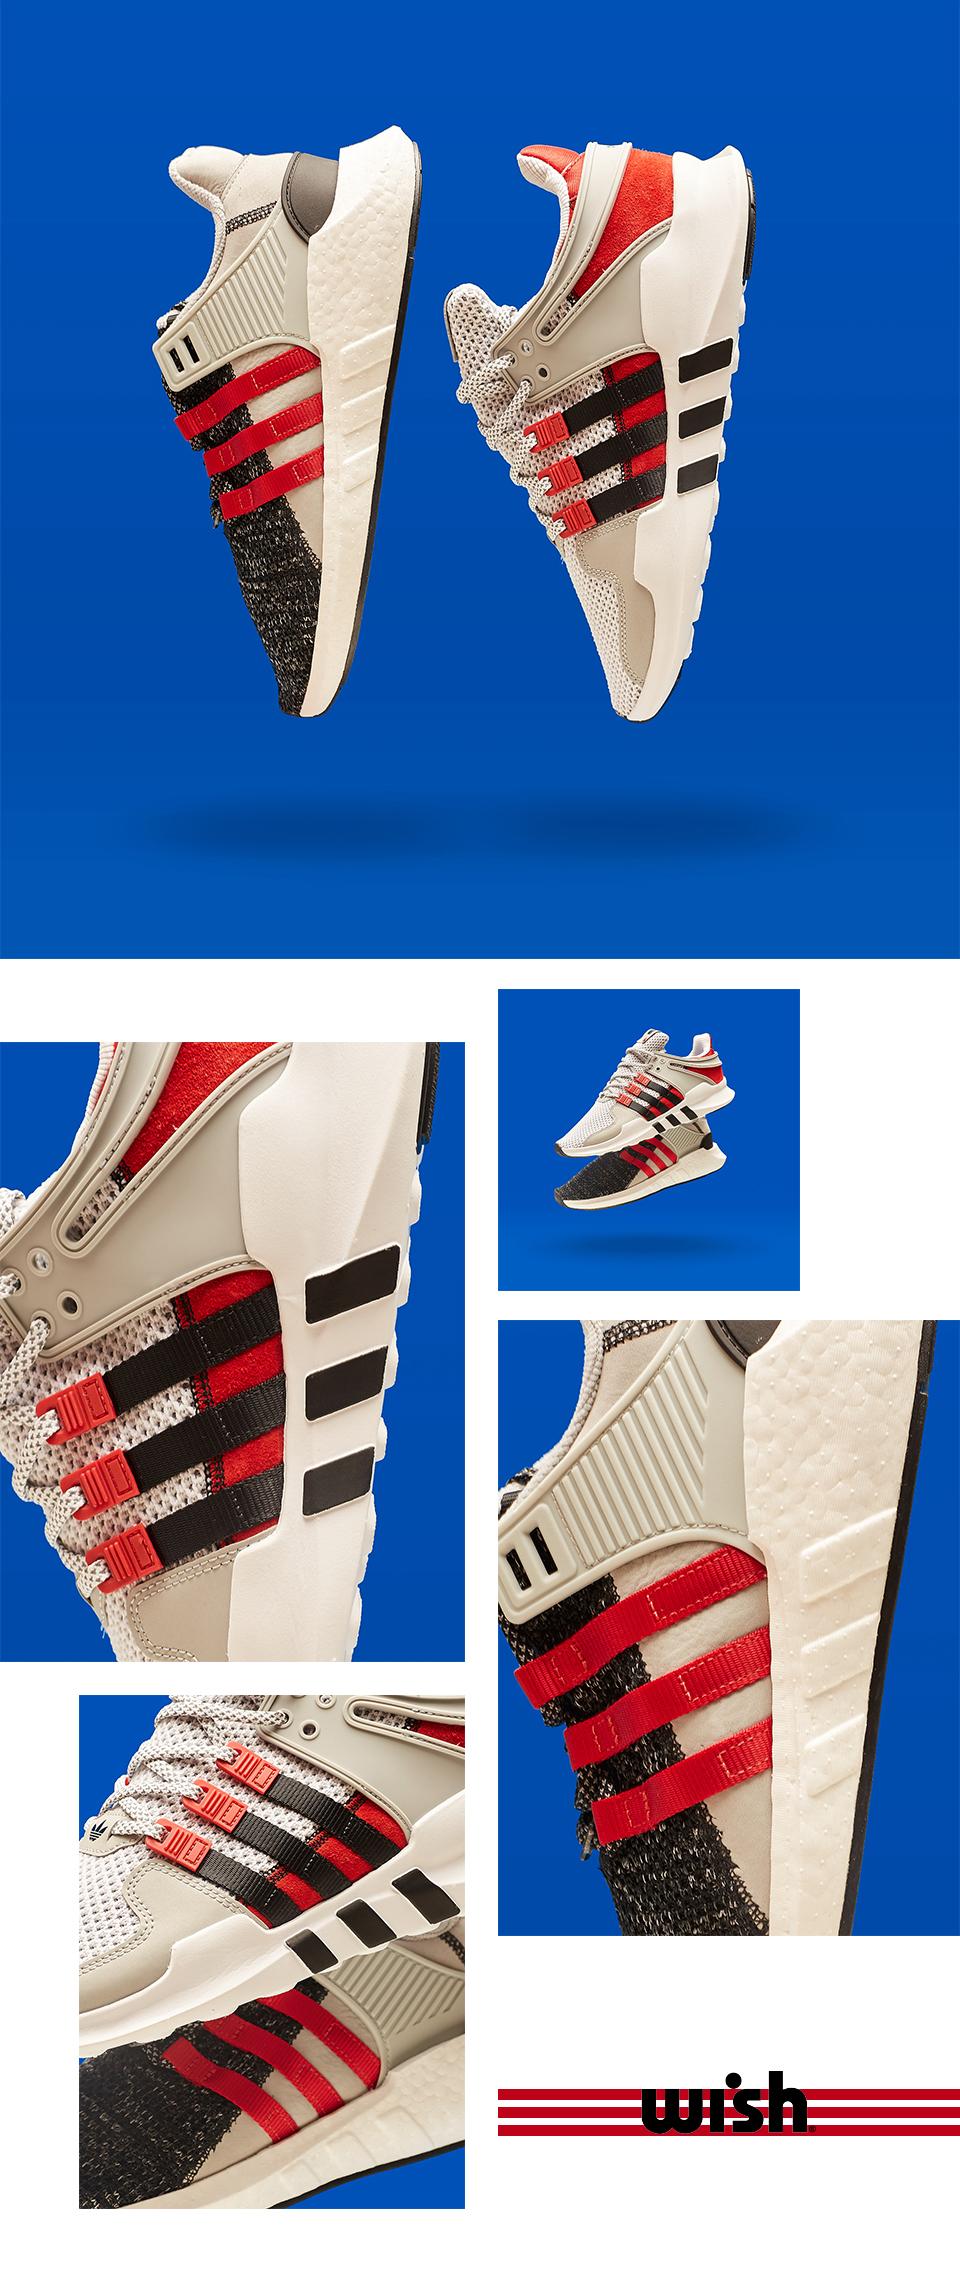 Overkill x Adidas EQT pack